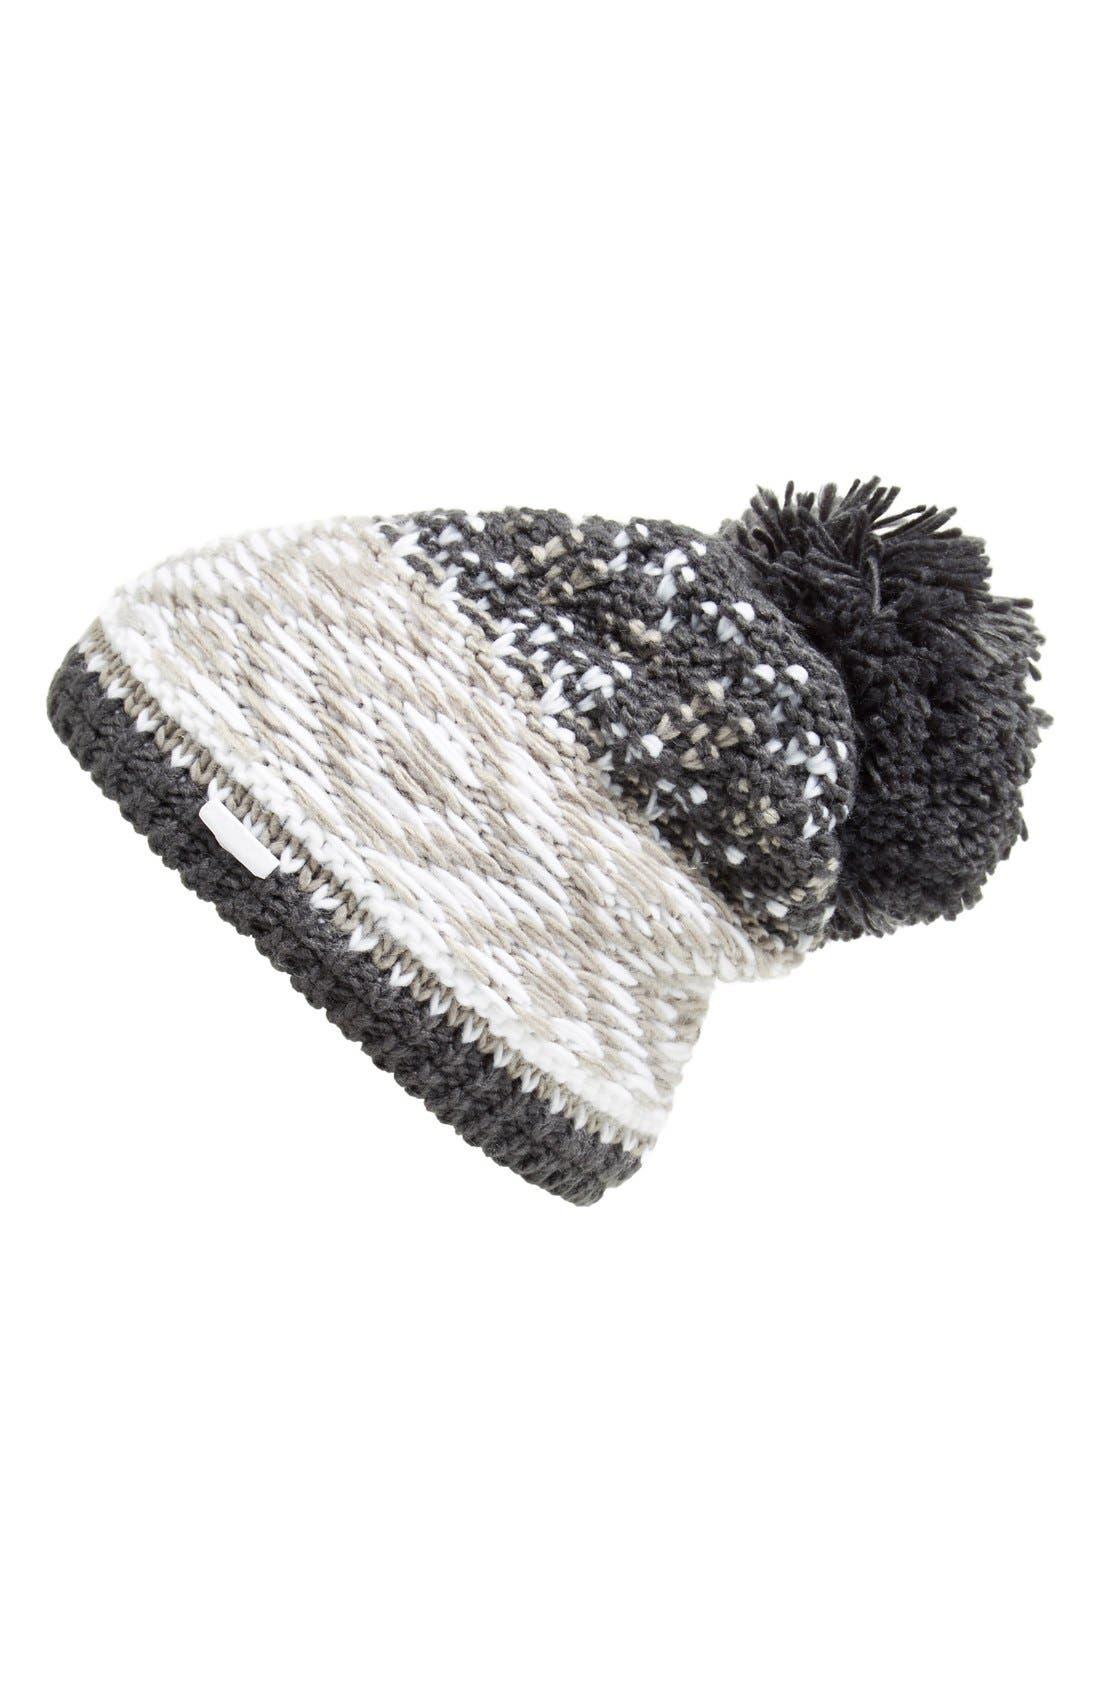 Alternate Image 1 Selected - LoleJacquard Knit Beanie